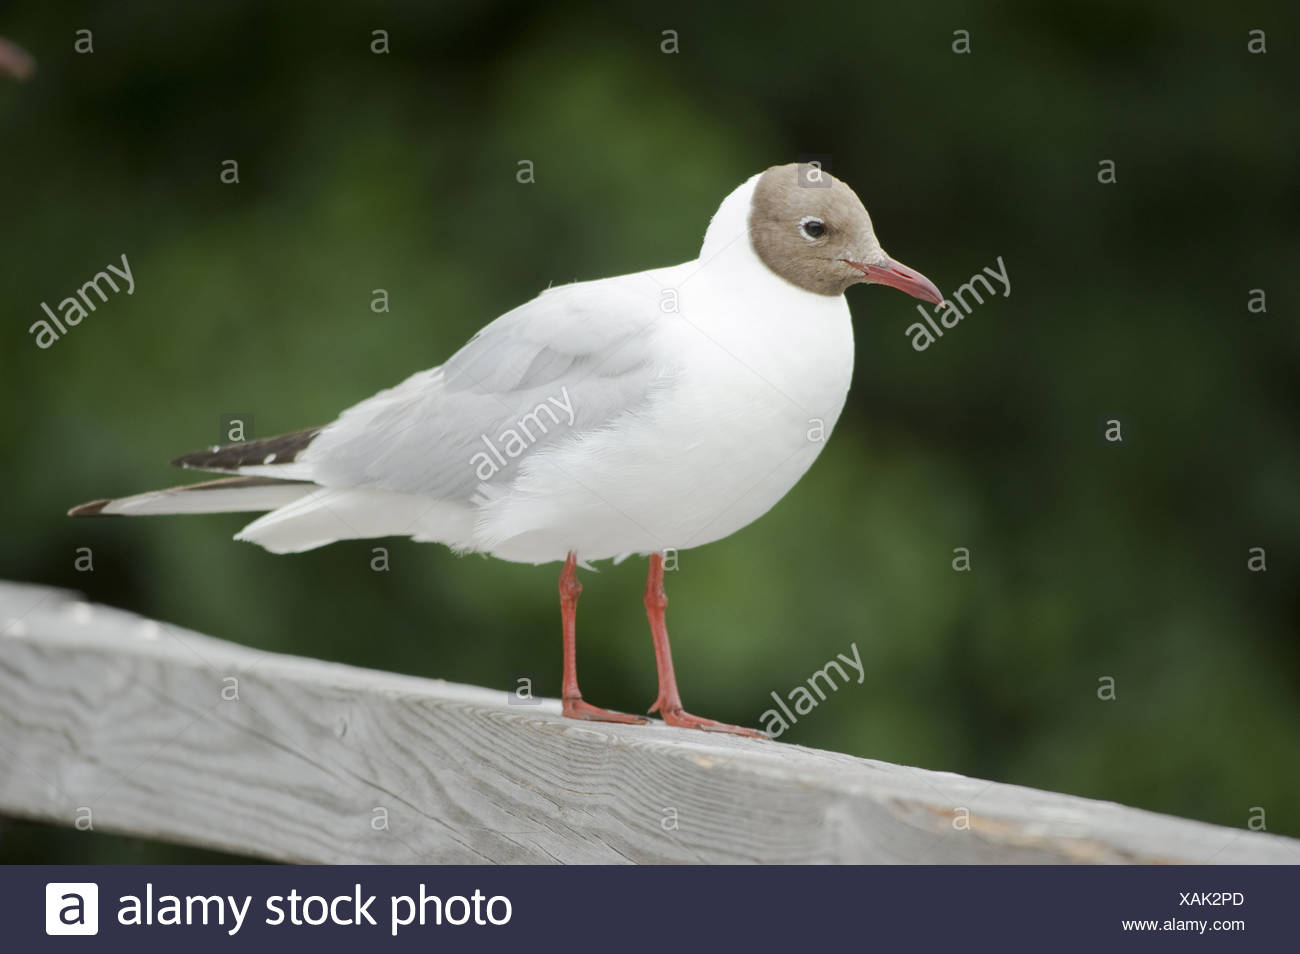 black-headed gull, larus ridibundus - Stock Image